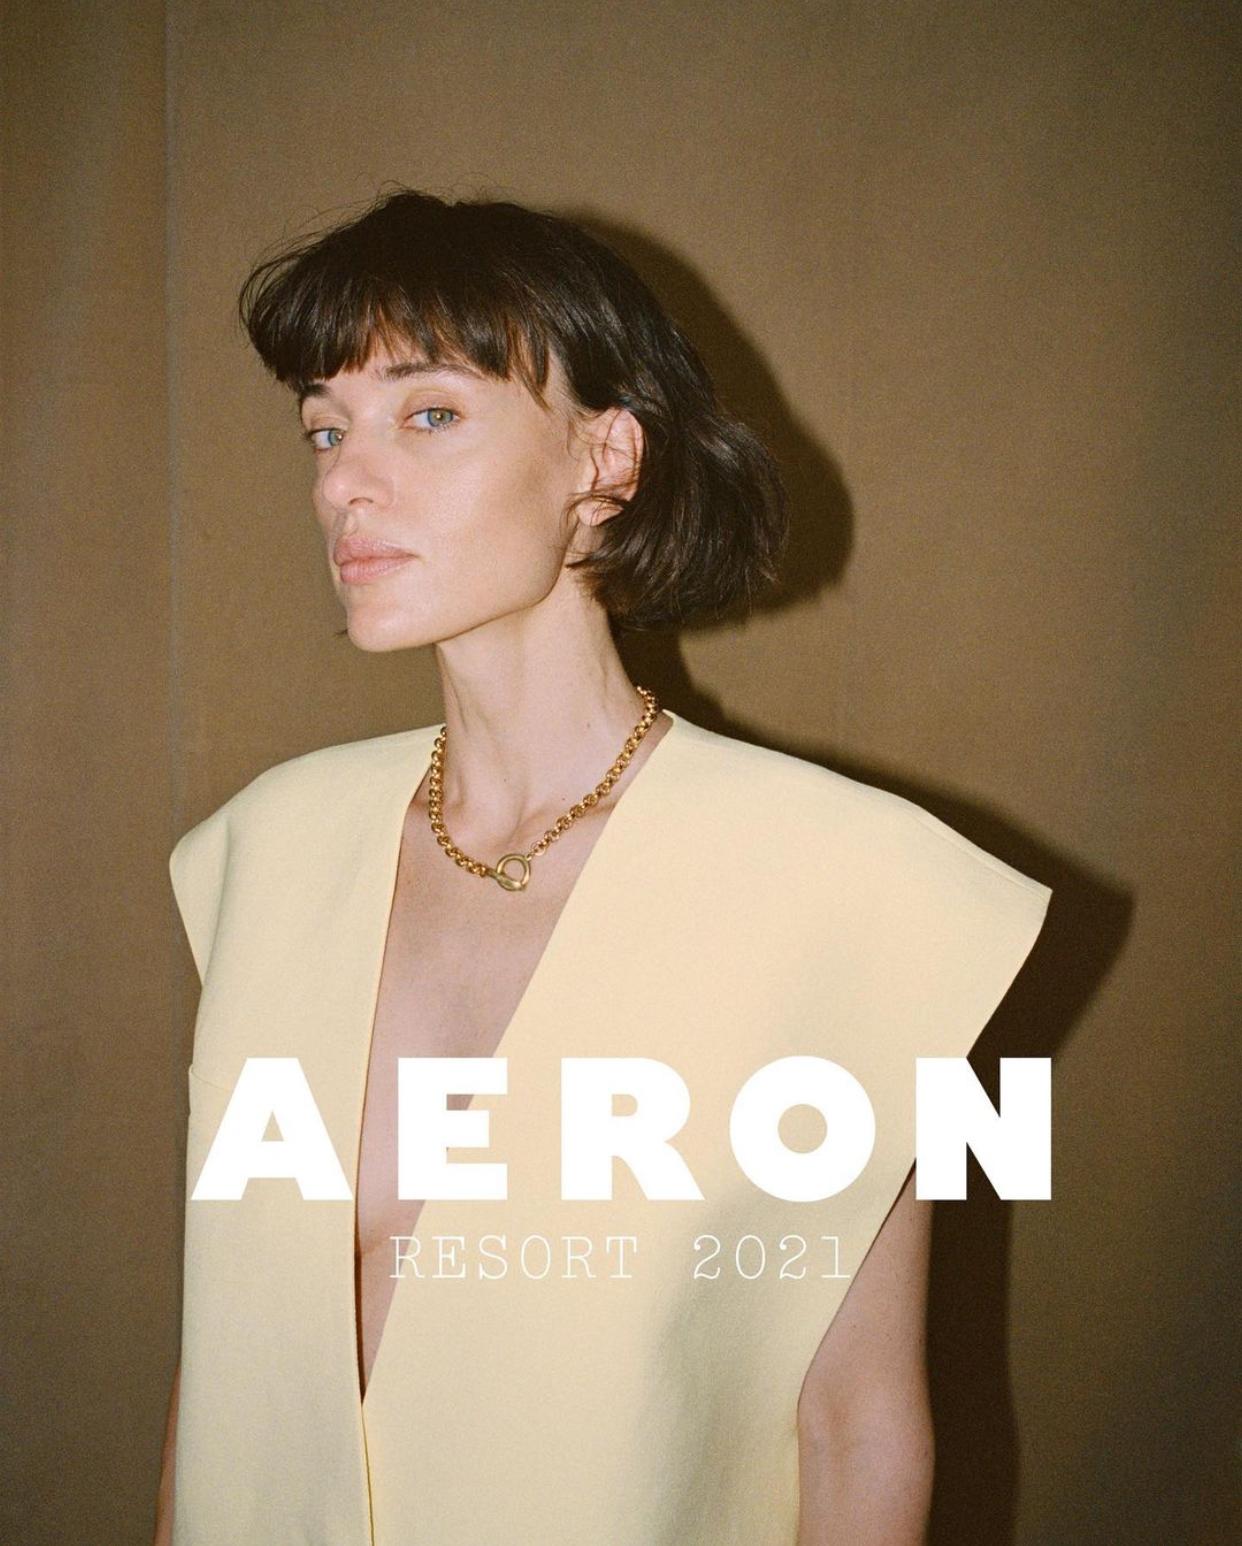 <strong>AERON</strong>NEW items